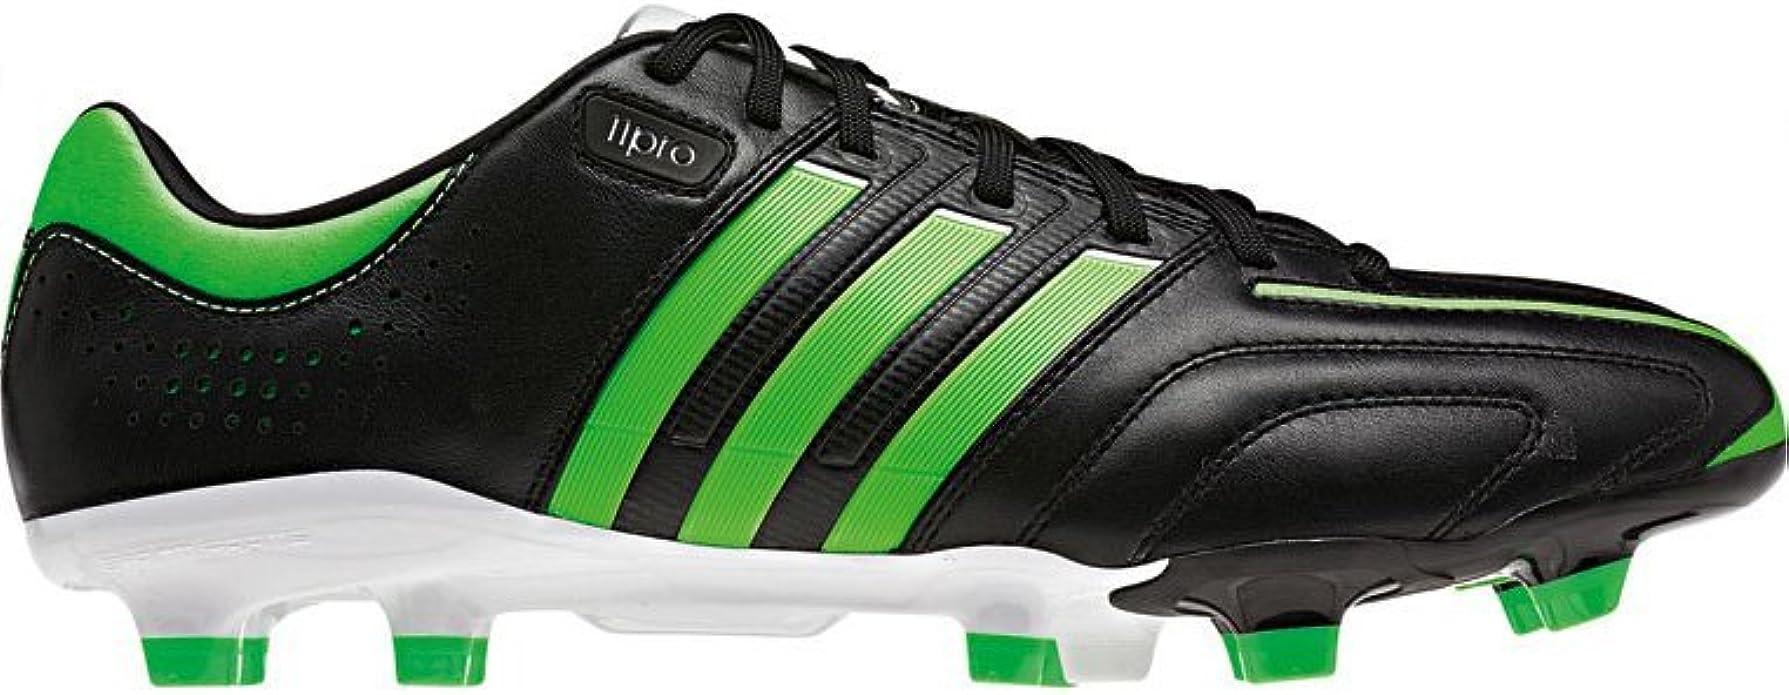 Adidas - Modelo : Q23806 Adipure 11Pro Trx Fg - Bota de ...